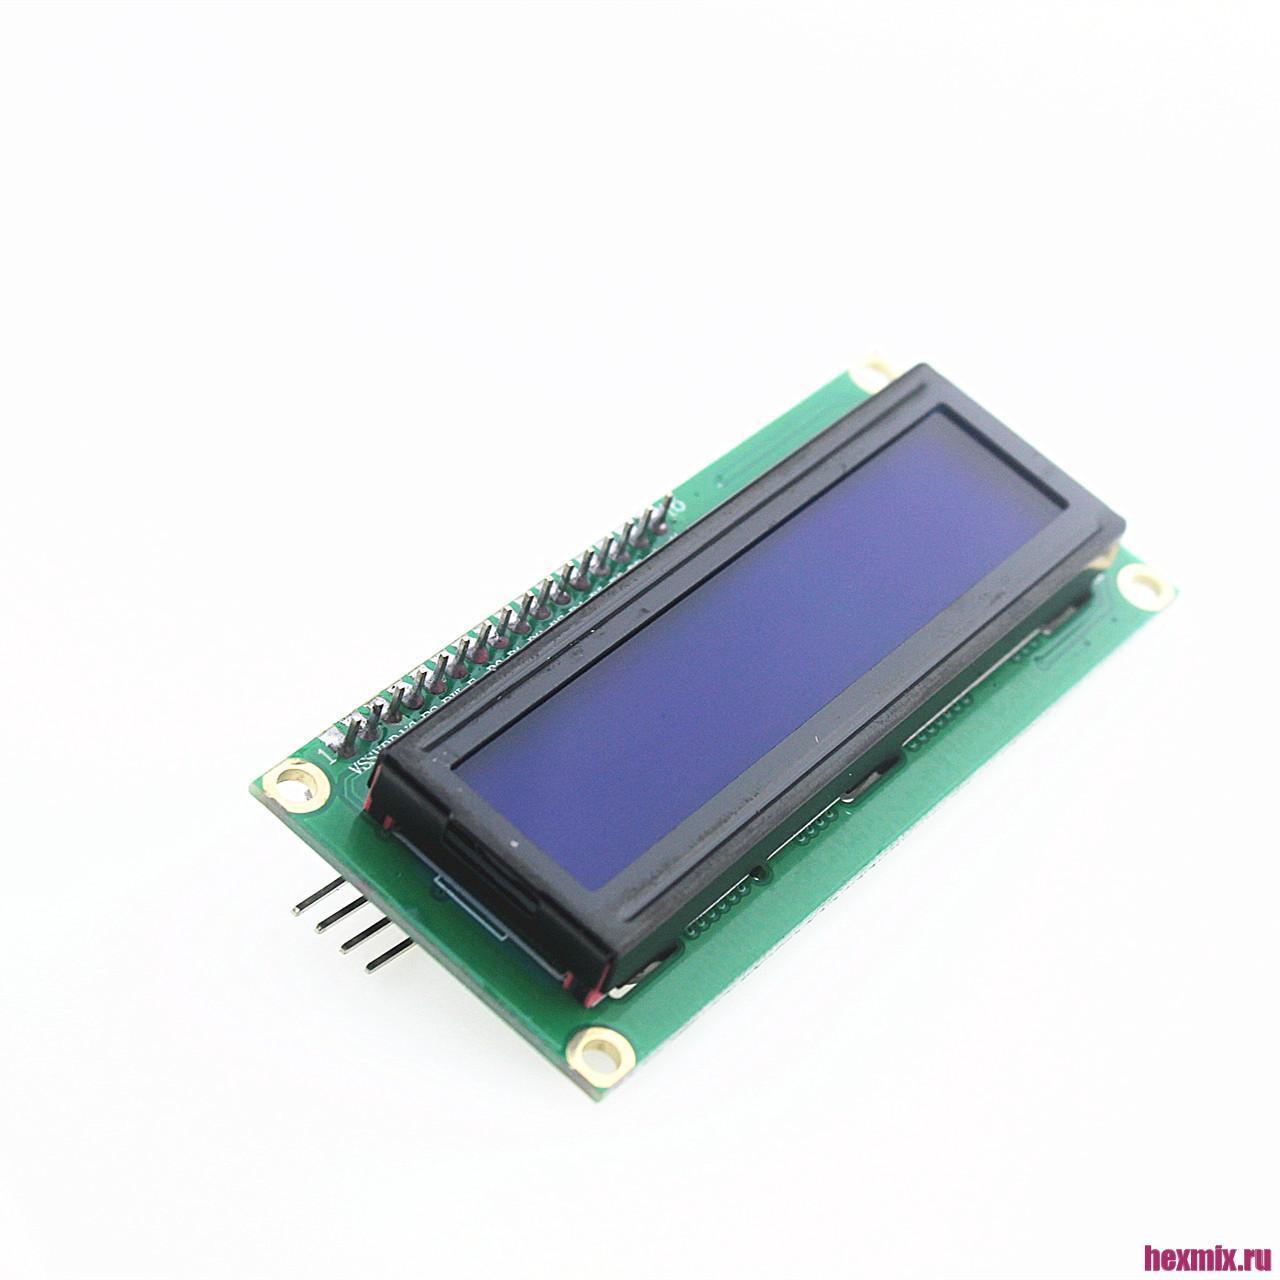 LCD 1602 I2C Display Symbol Blue